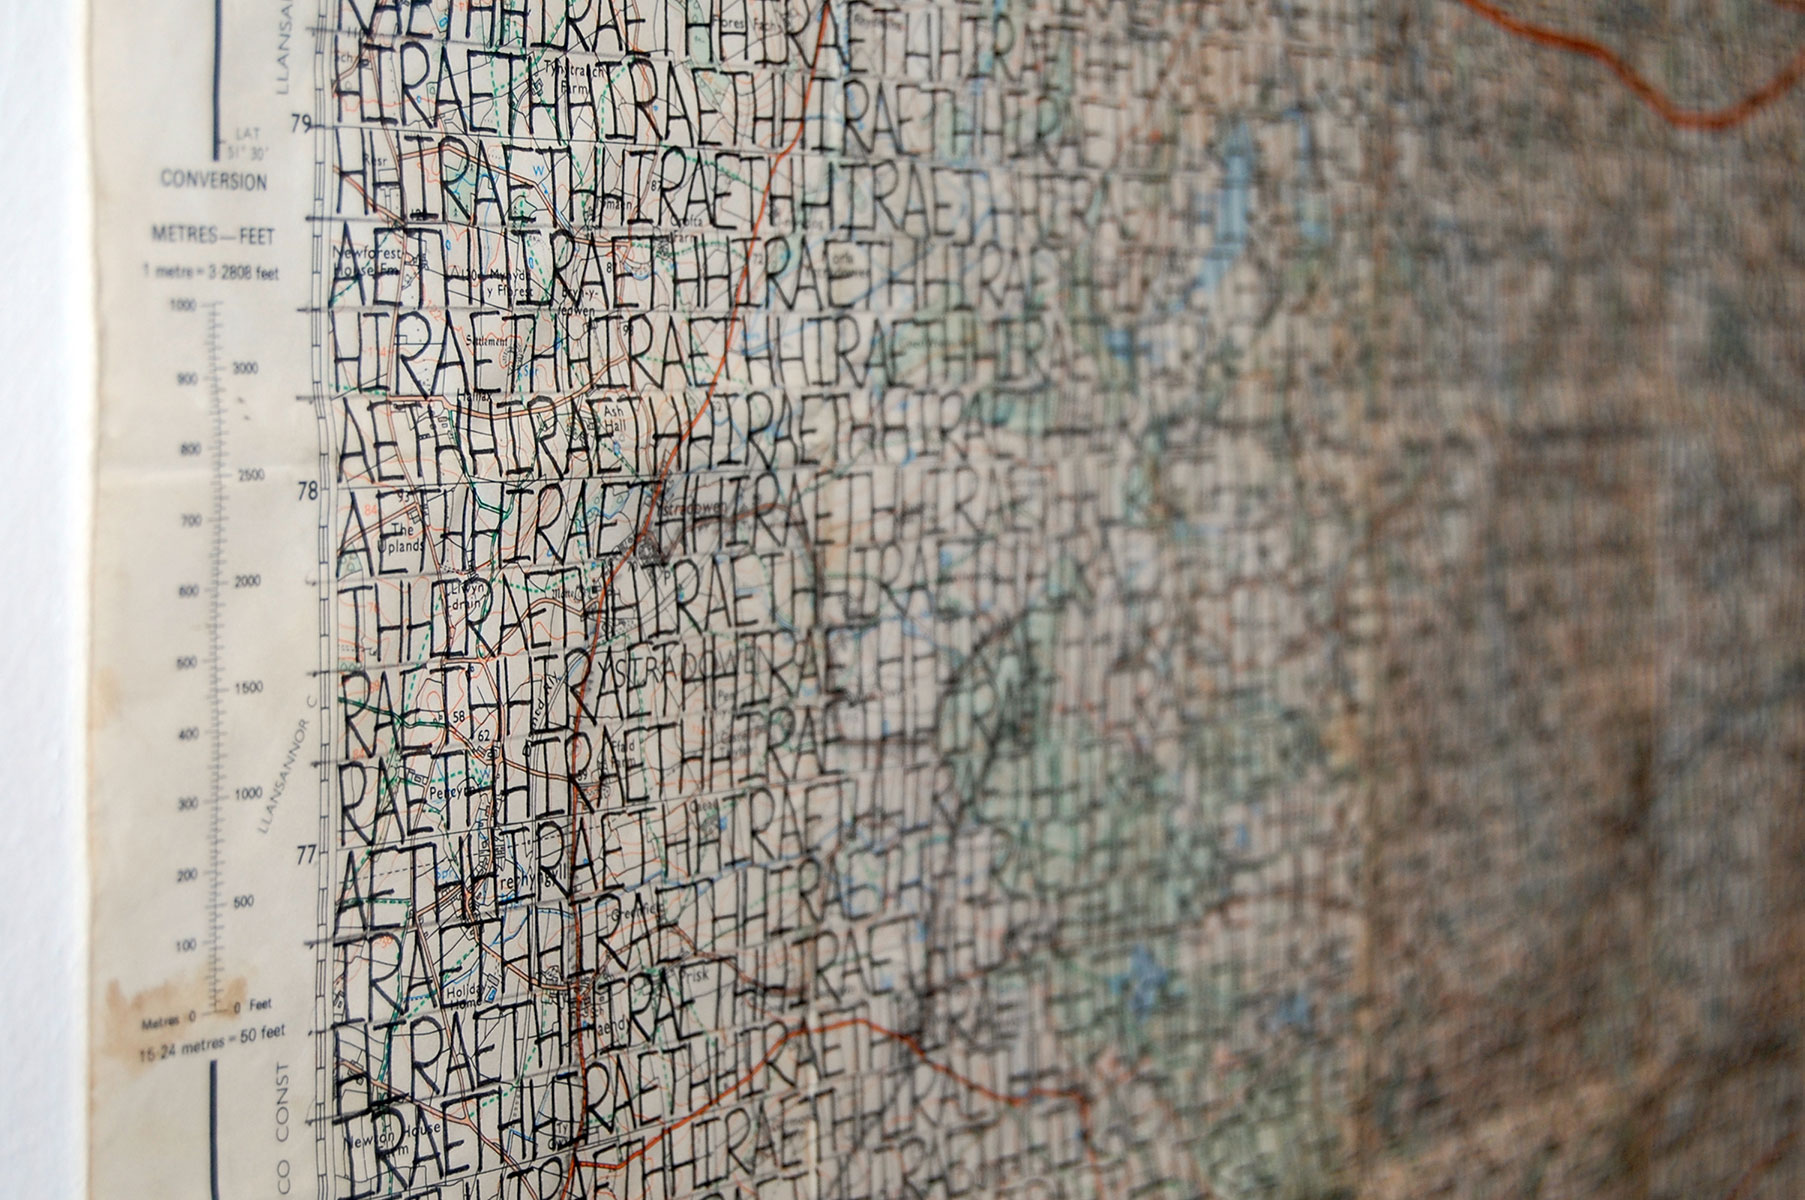 Map Drawings - Hiraeth